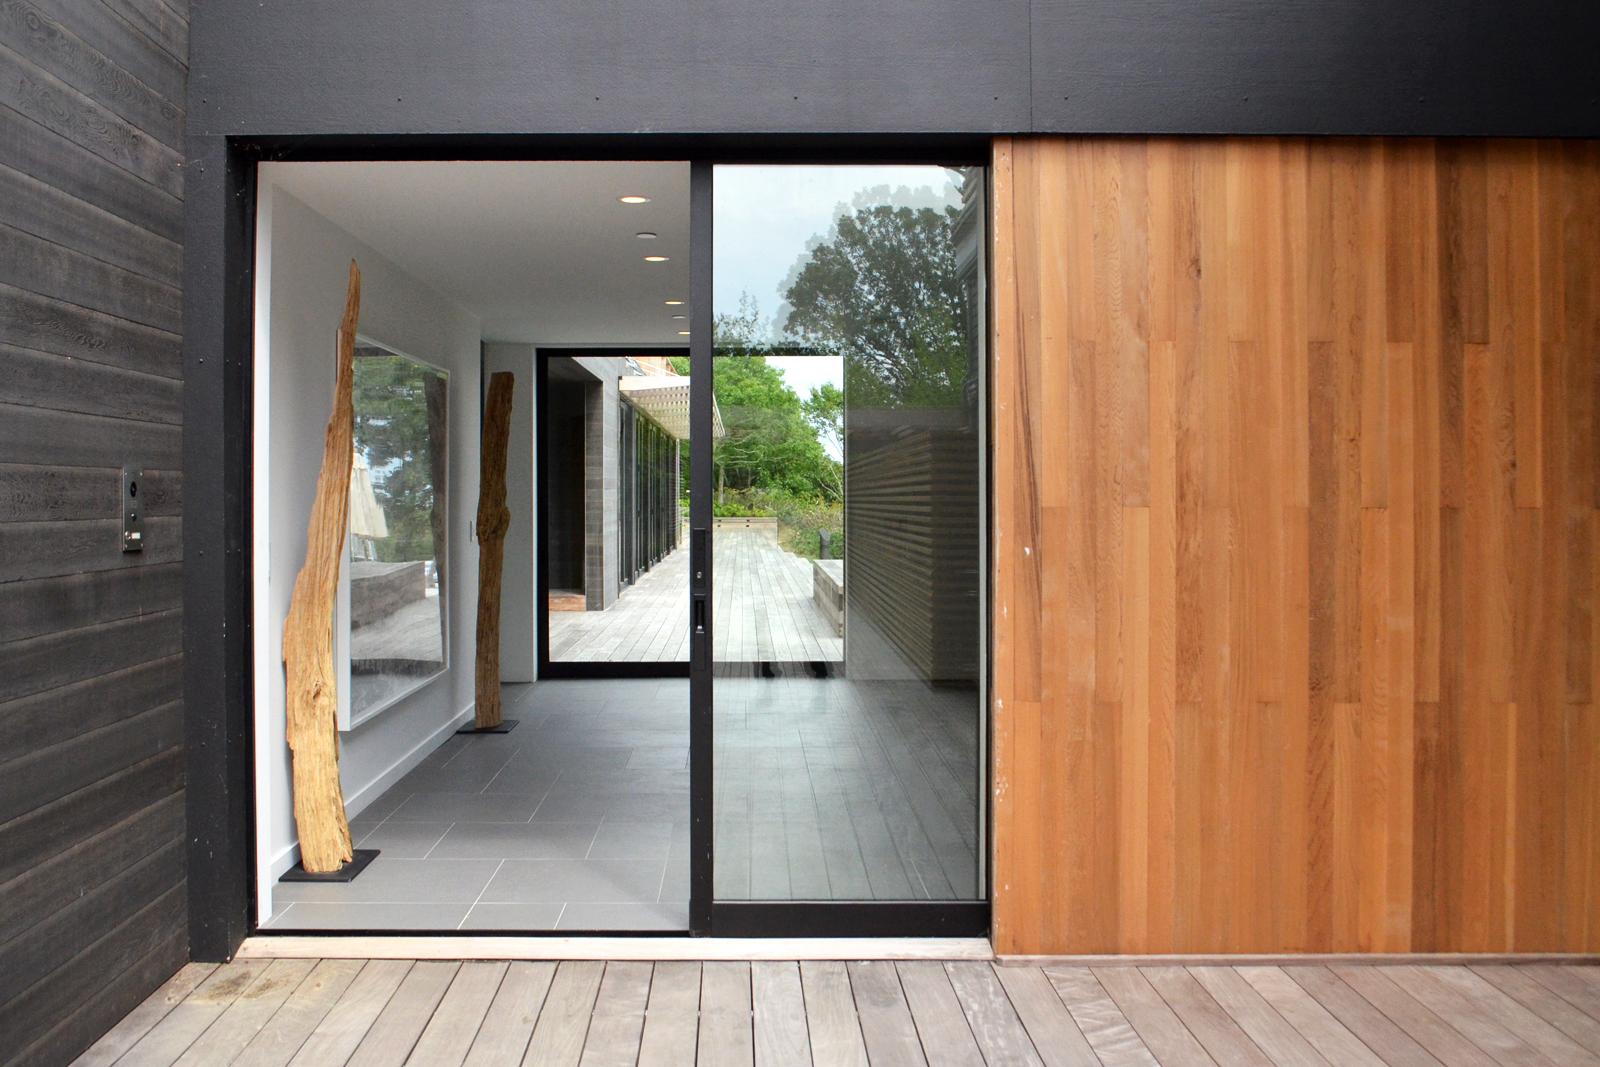 res4-resolution-4-architecture-modern-modular-house-prefab-amagansett-addition-exterior-interior-door.jpg